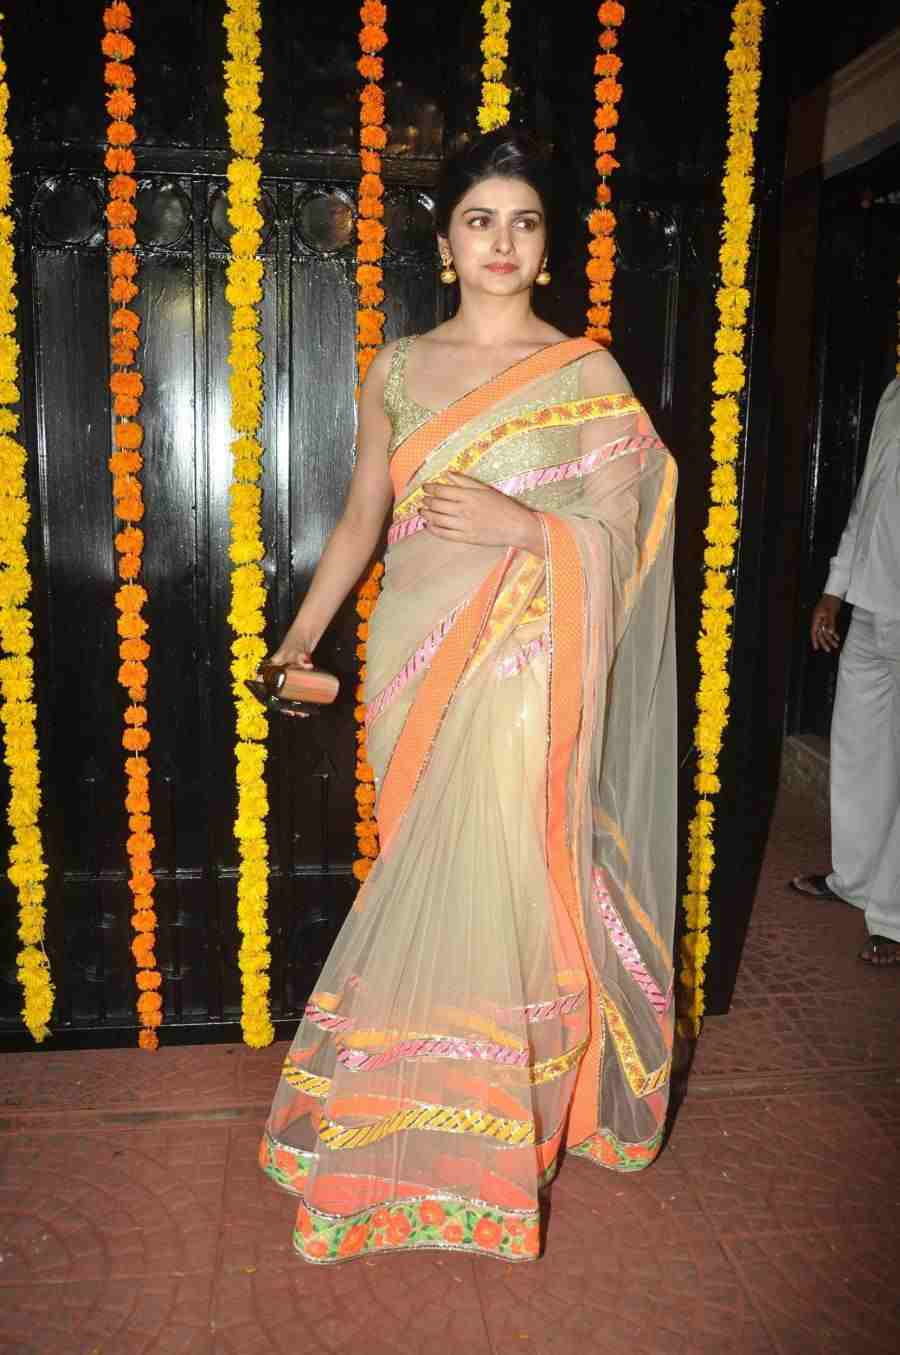 Beautiful Hindi Girl Prachi Desai Navel Show In Transparent Yellow Saree